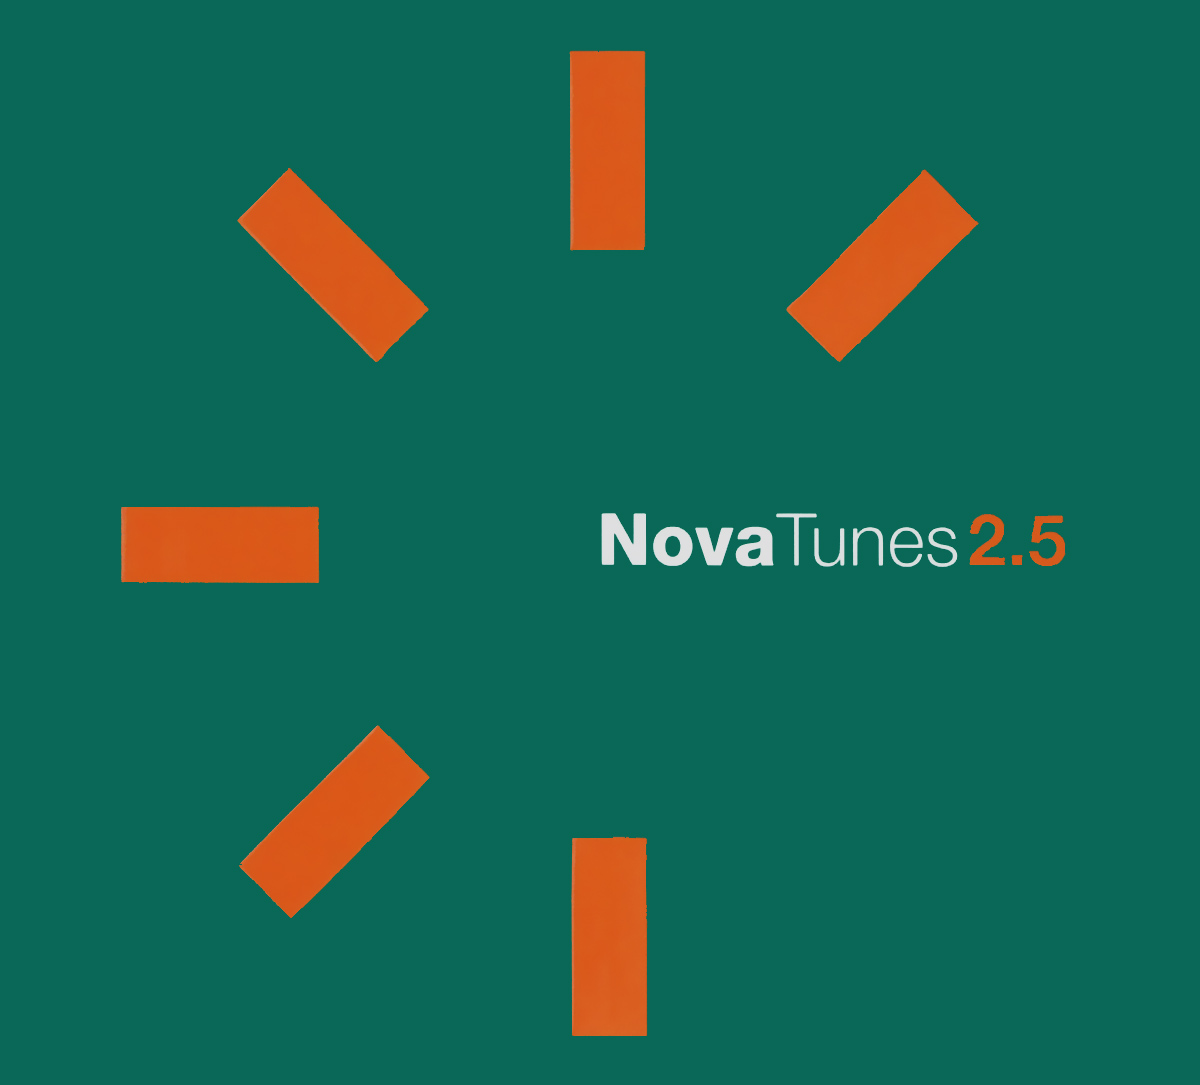 Nova Tunes 2.5